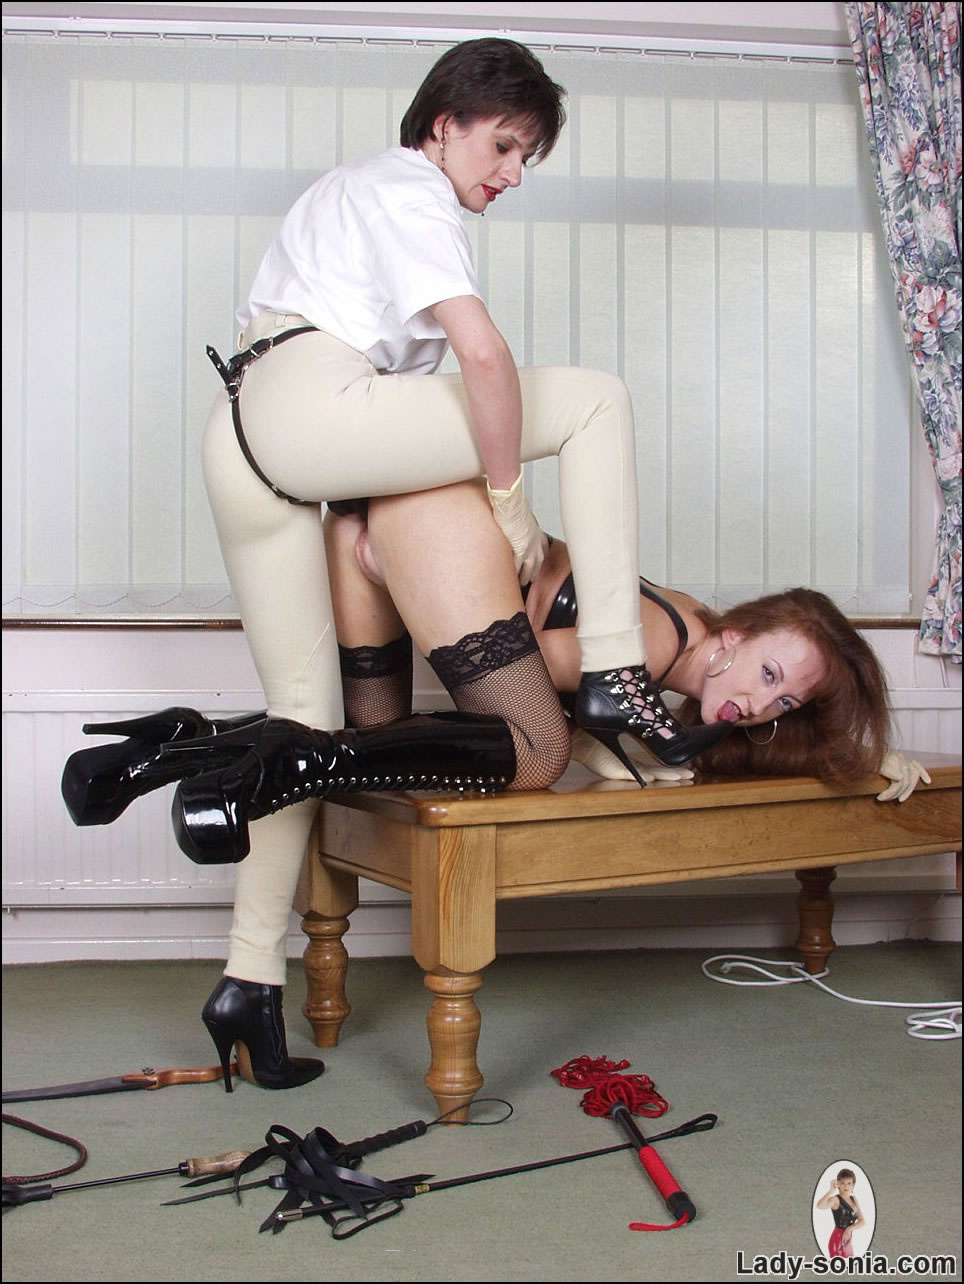 Porno Lady Sonja